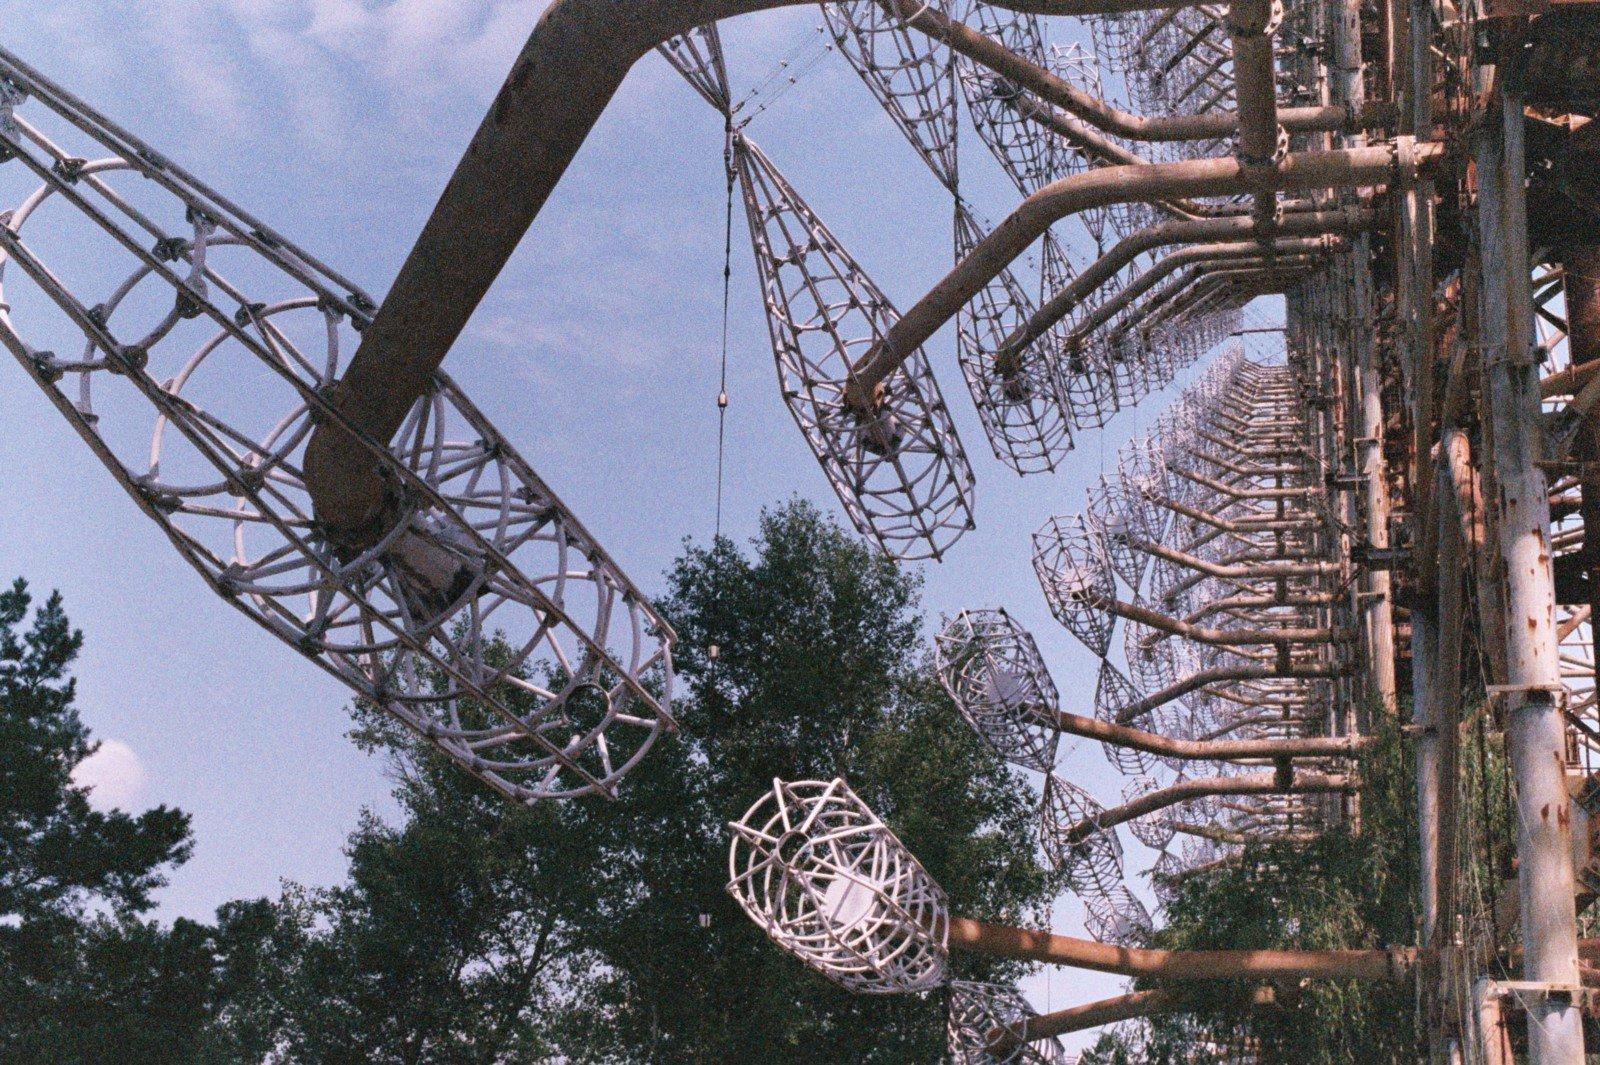 snaeking-into-chernobyl9 SNEAKING INTO CHERNOBYL